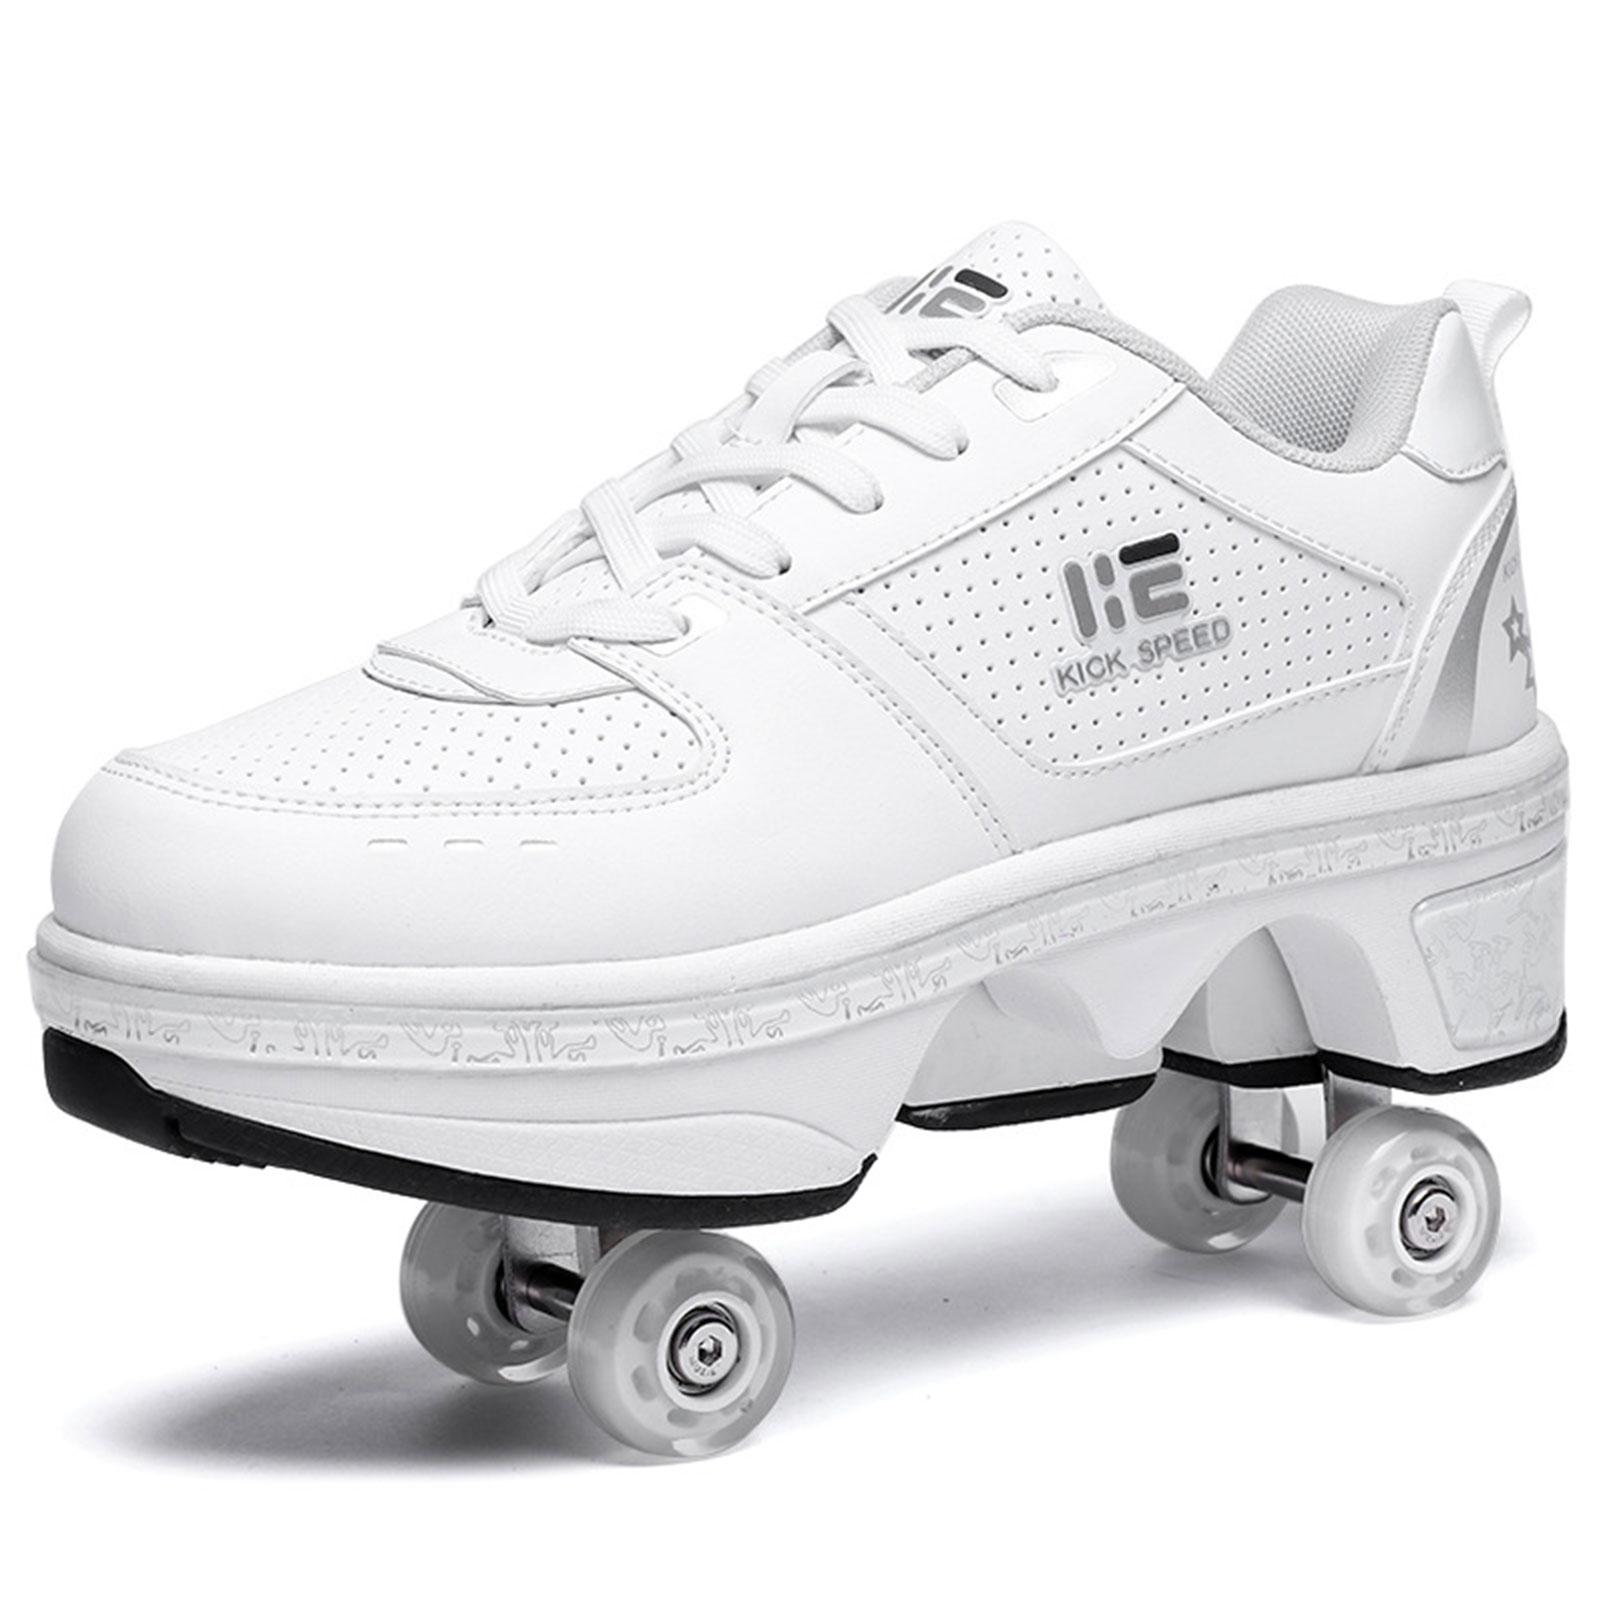 Roller Shoes Sneakers Walk Skates Deform Wheel Skates For Adult Men Wmen Unisex Couple Childred Runa